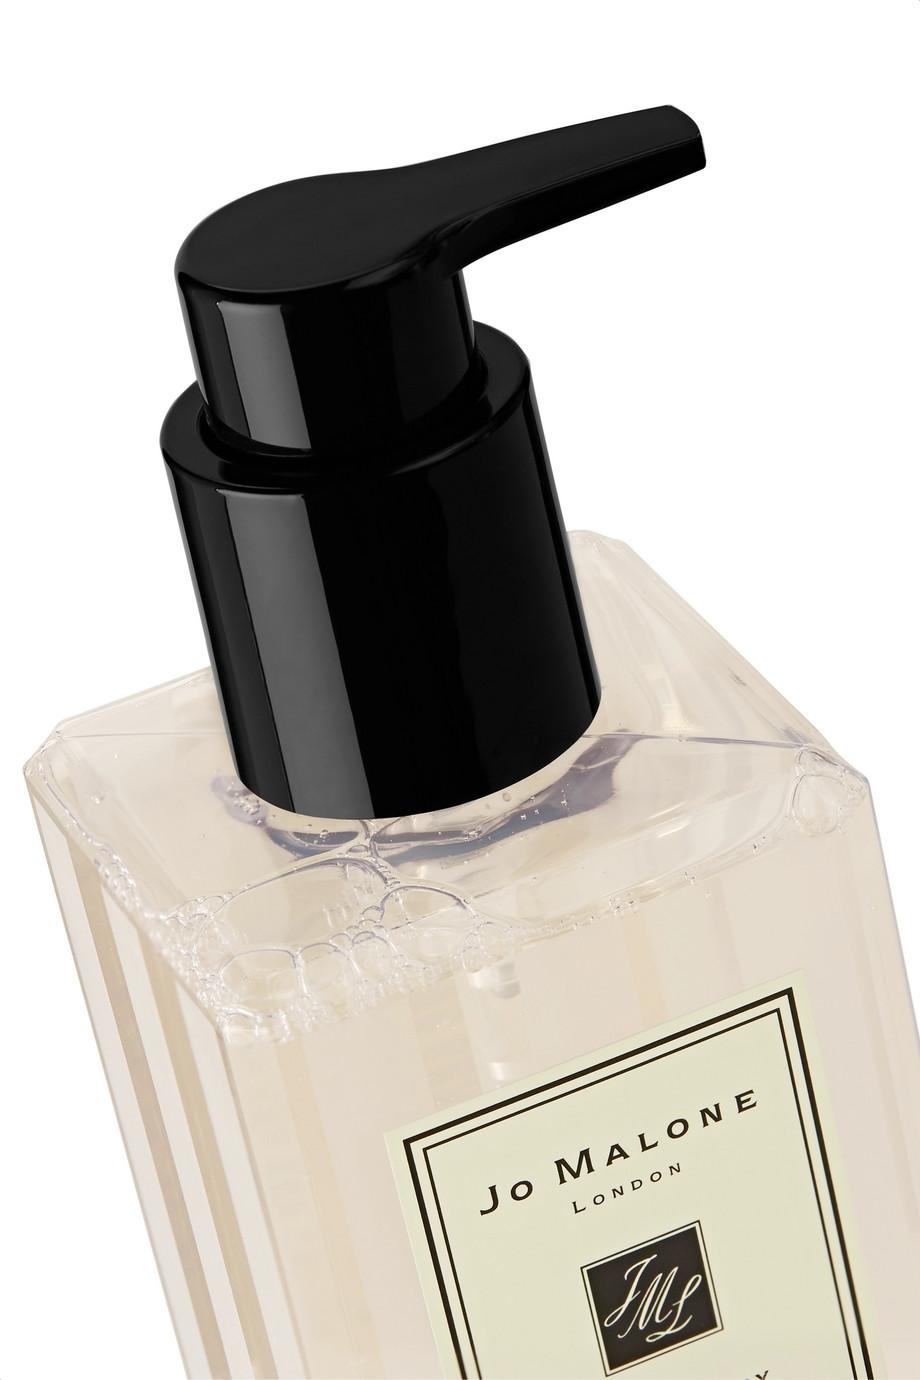 Jo Malone London Peony & Blush Suede Body & Hand Wash, 250ml